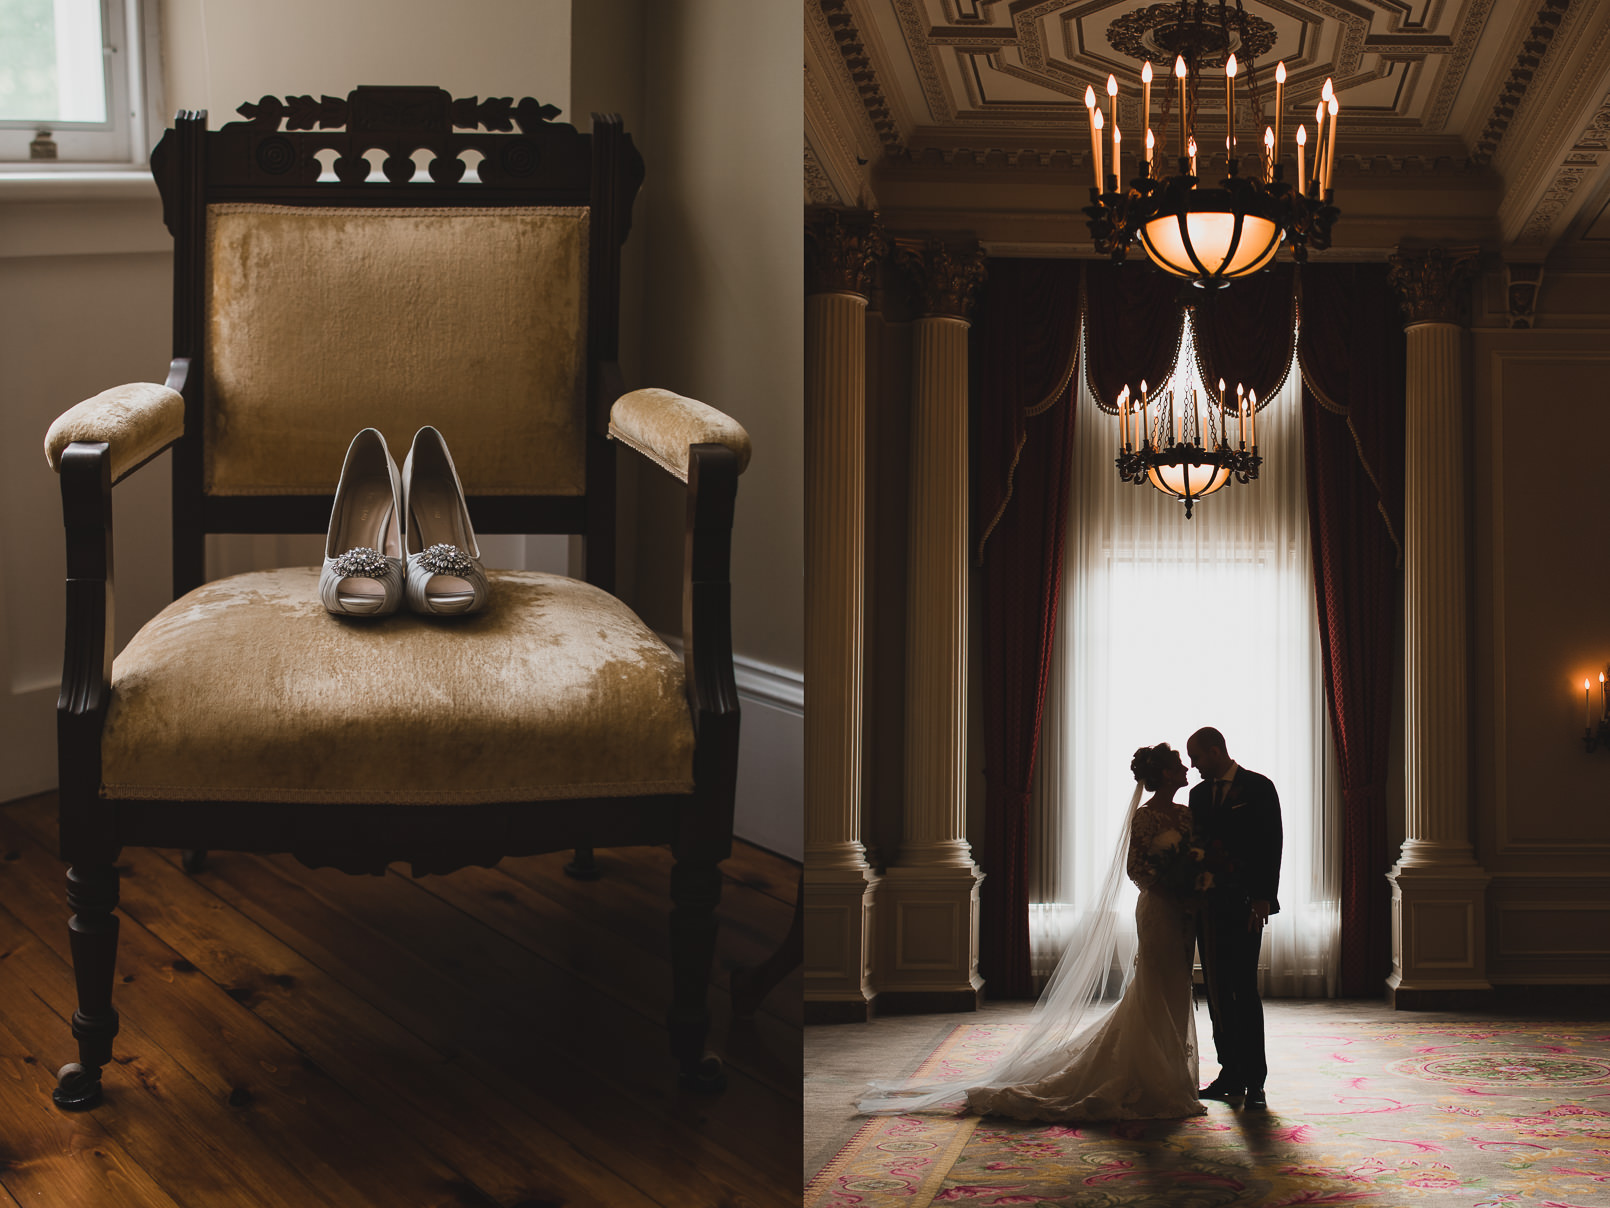 024-Jonathan-Kuhn-Photography-Wedding-_mini.jpg